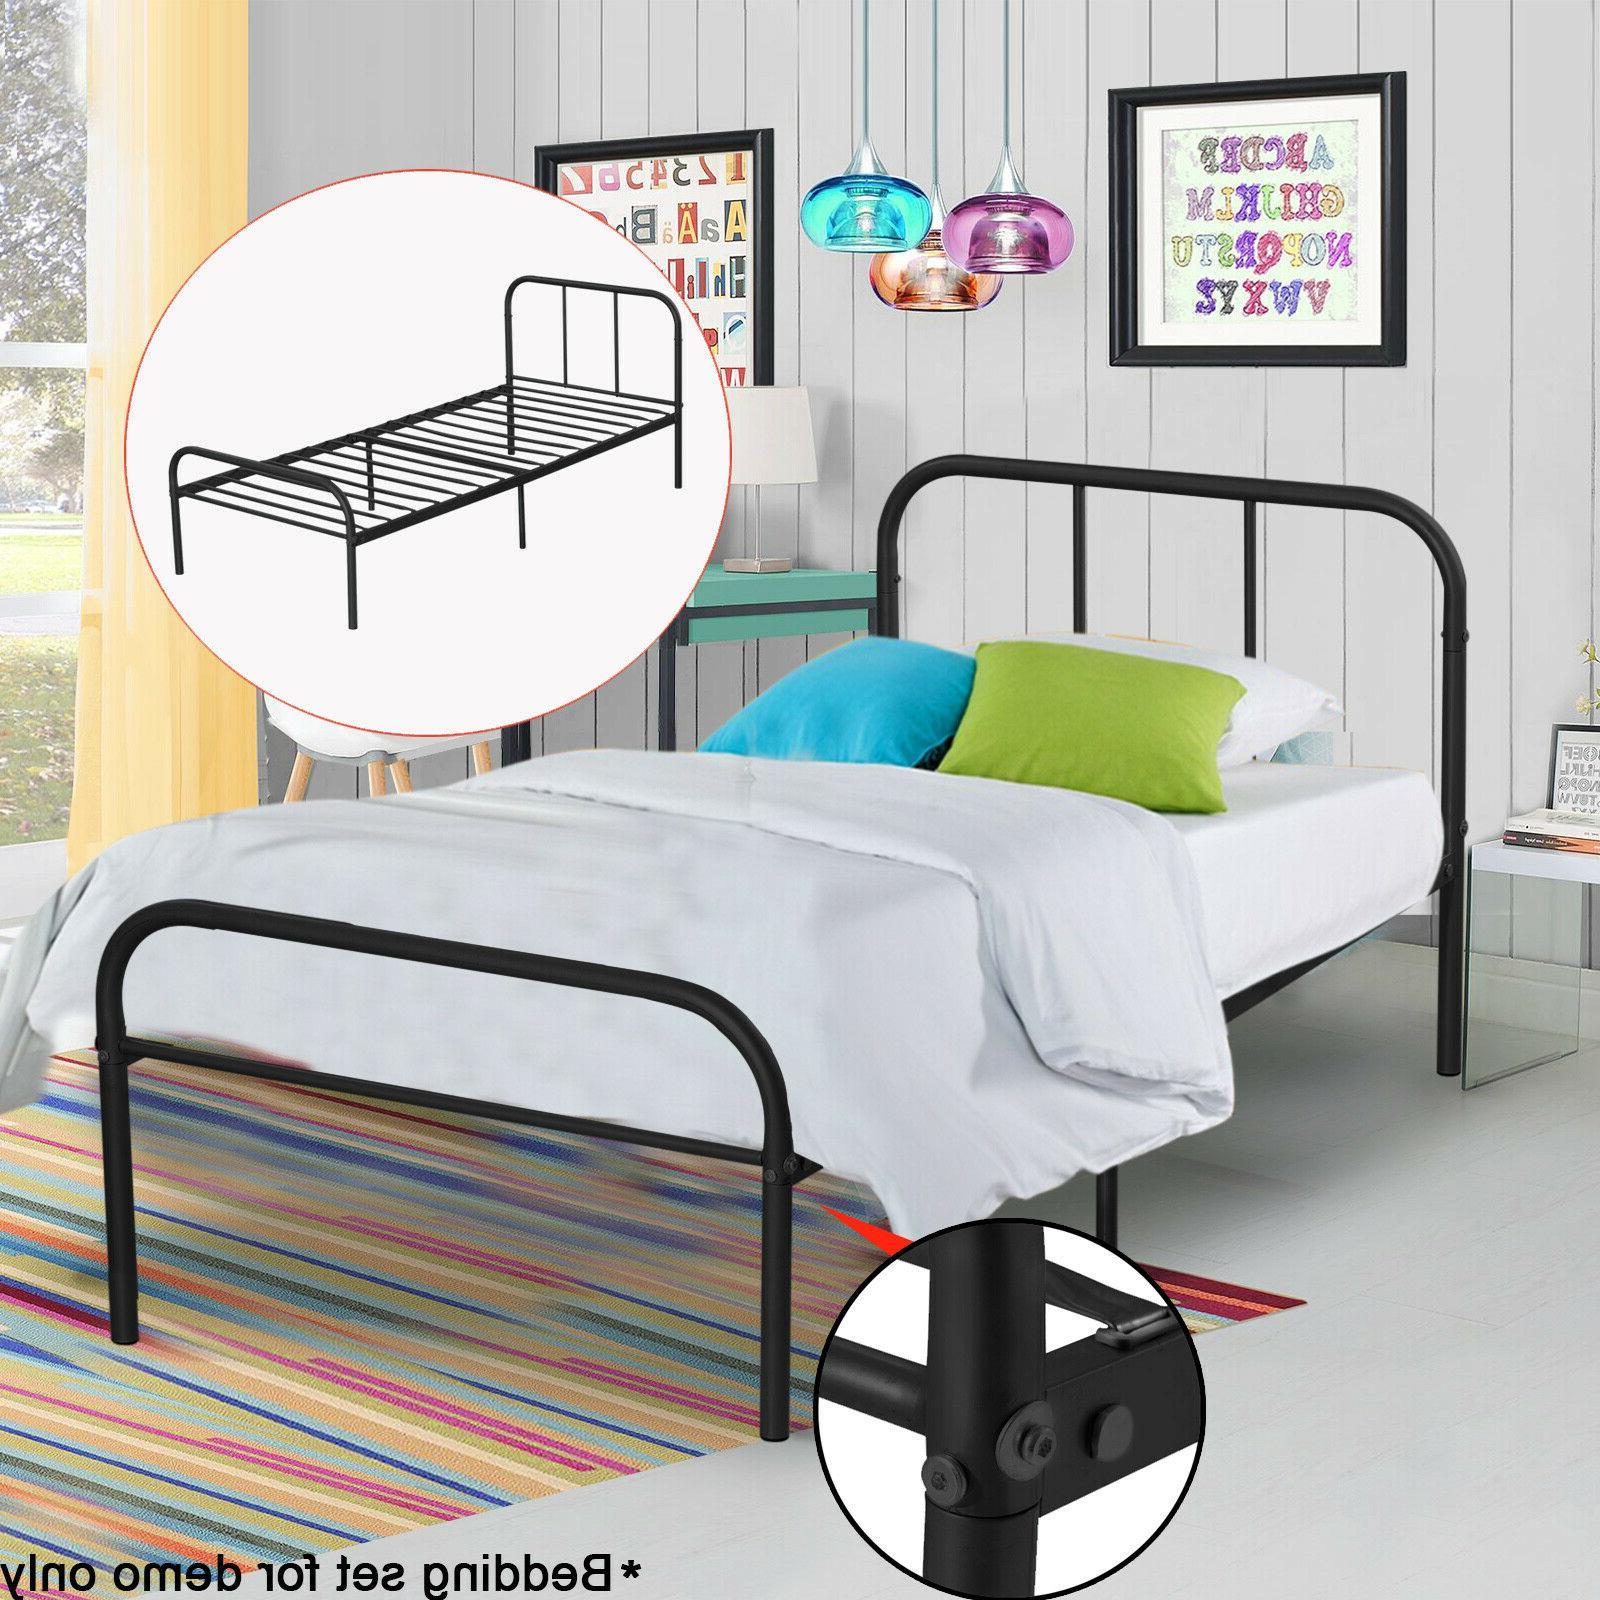 Metal Bed Frame Twin Size Black Headboard Platform Mattress